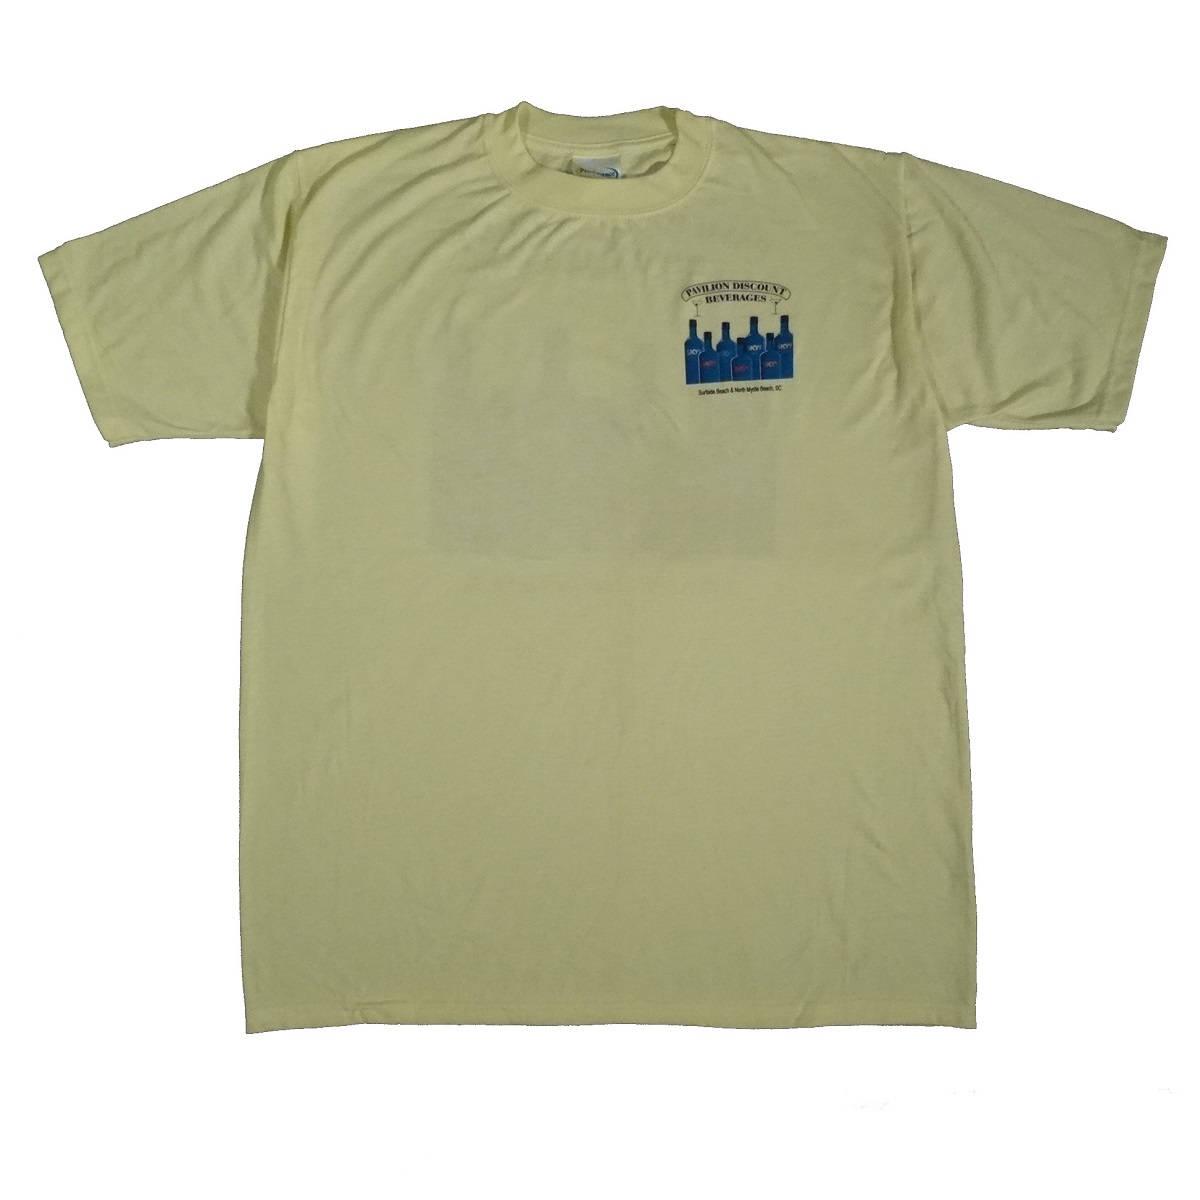 skyy vodka myrtle beach liquor vintage shirt front of shirt